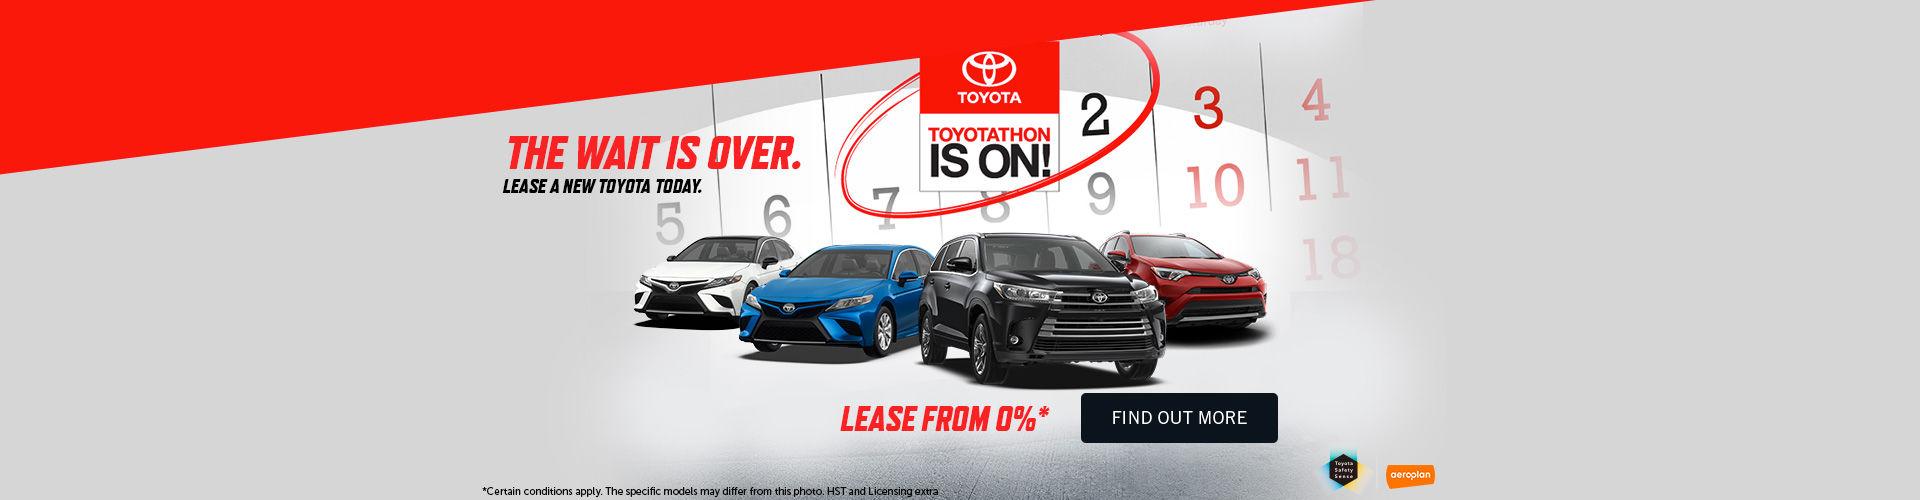 Toyota Event